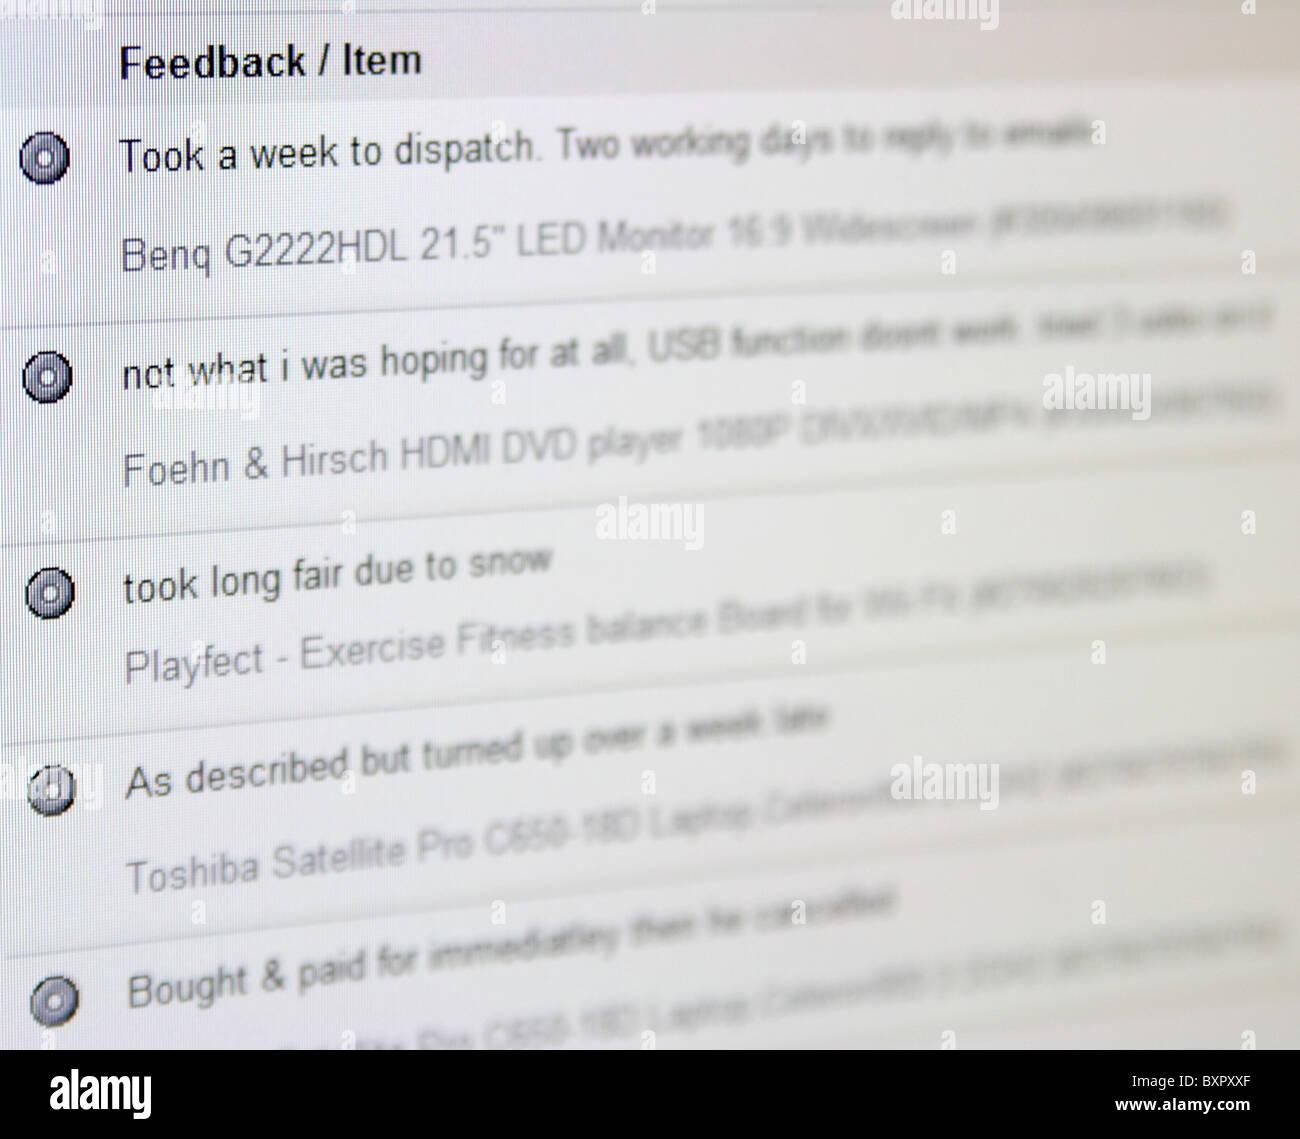 eBay neutral feedback - Stock Image